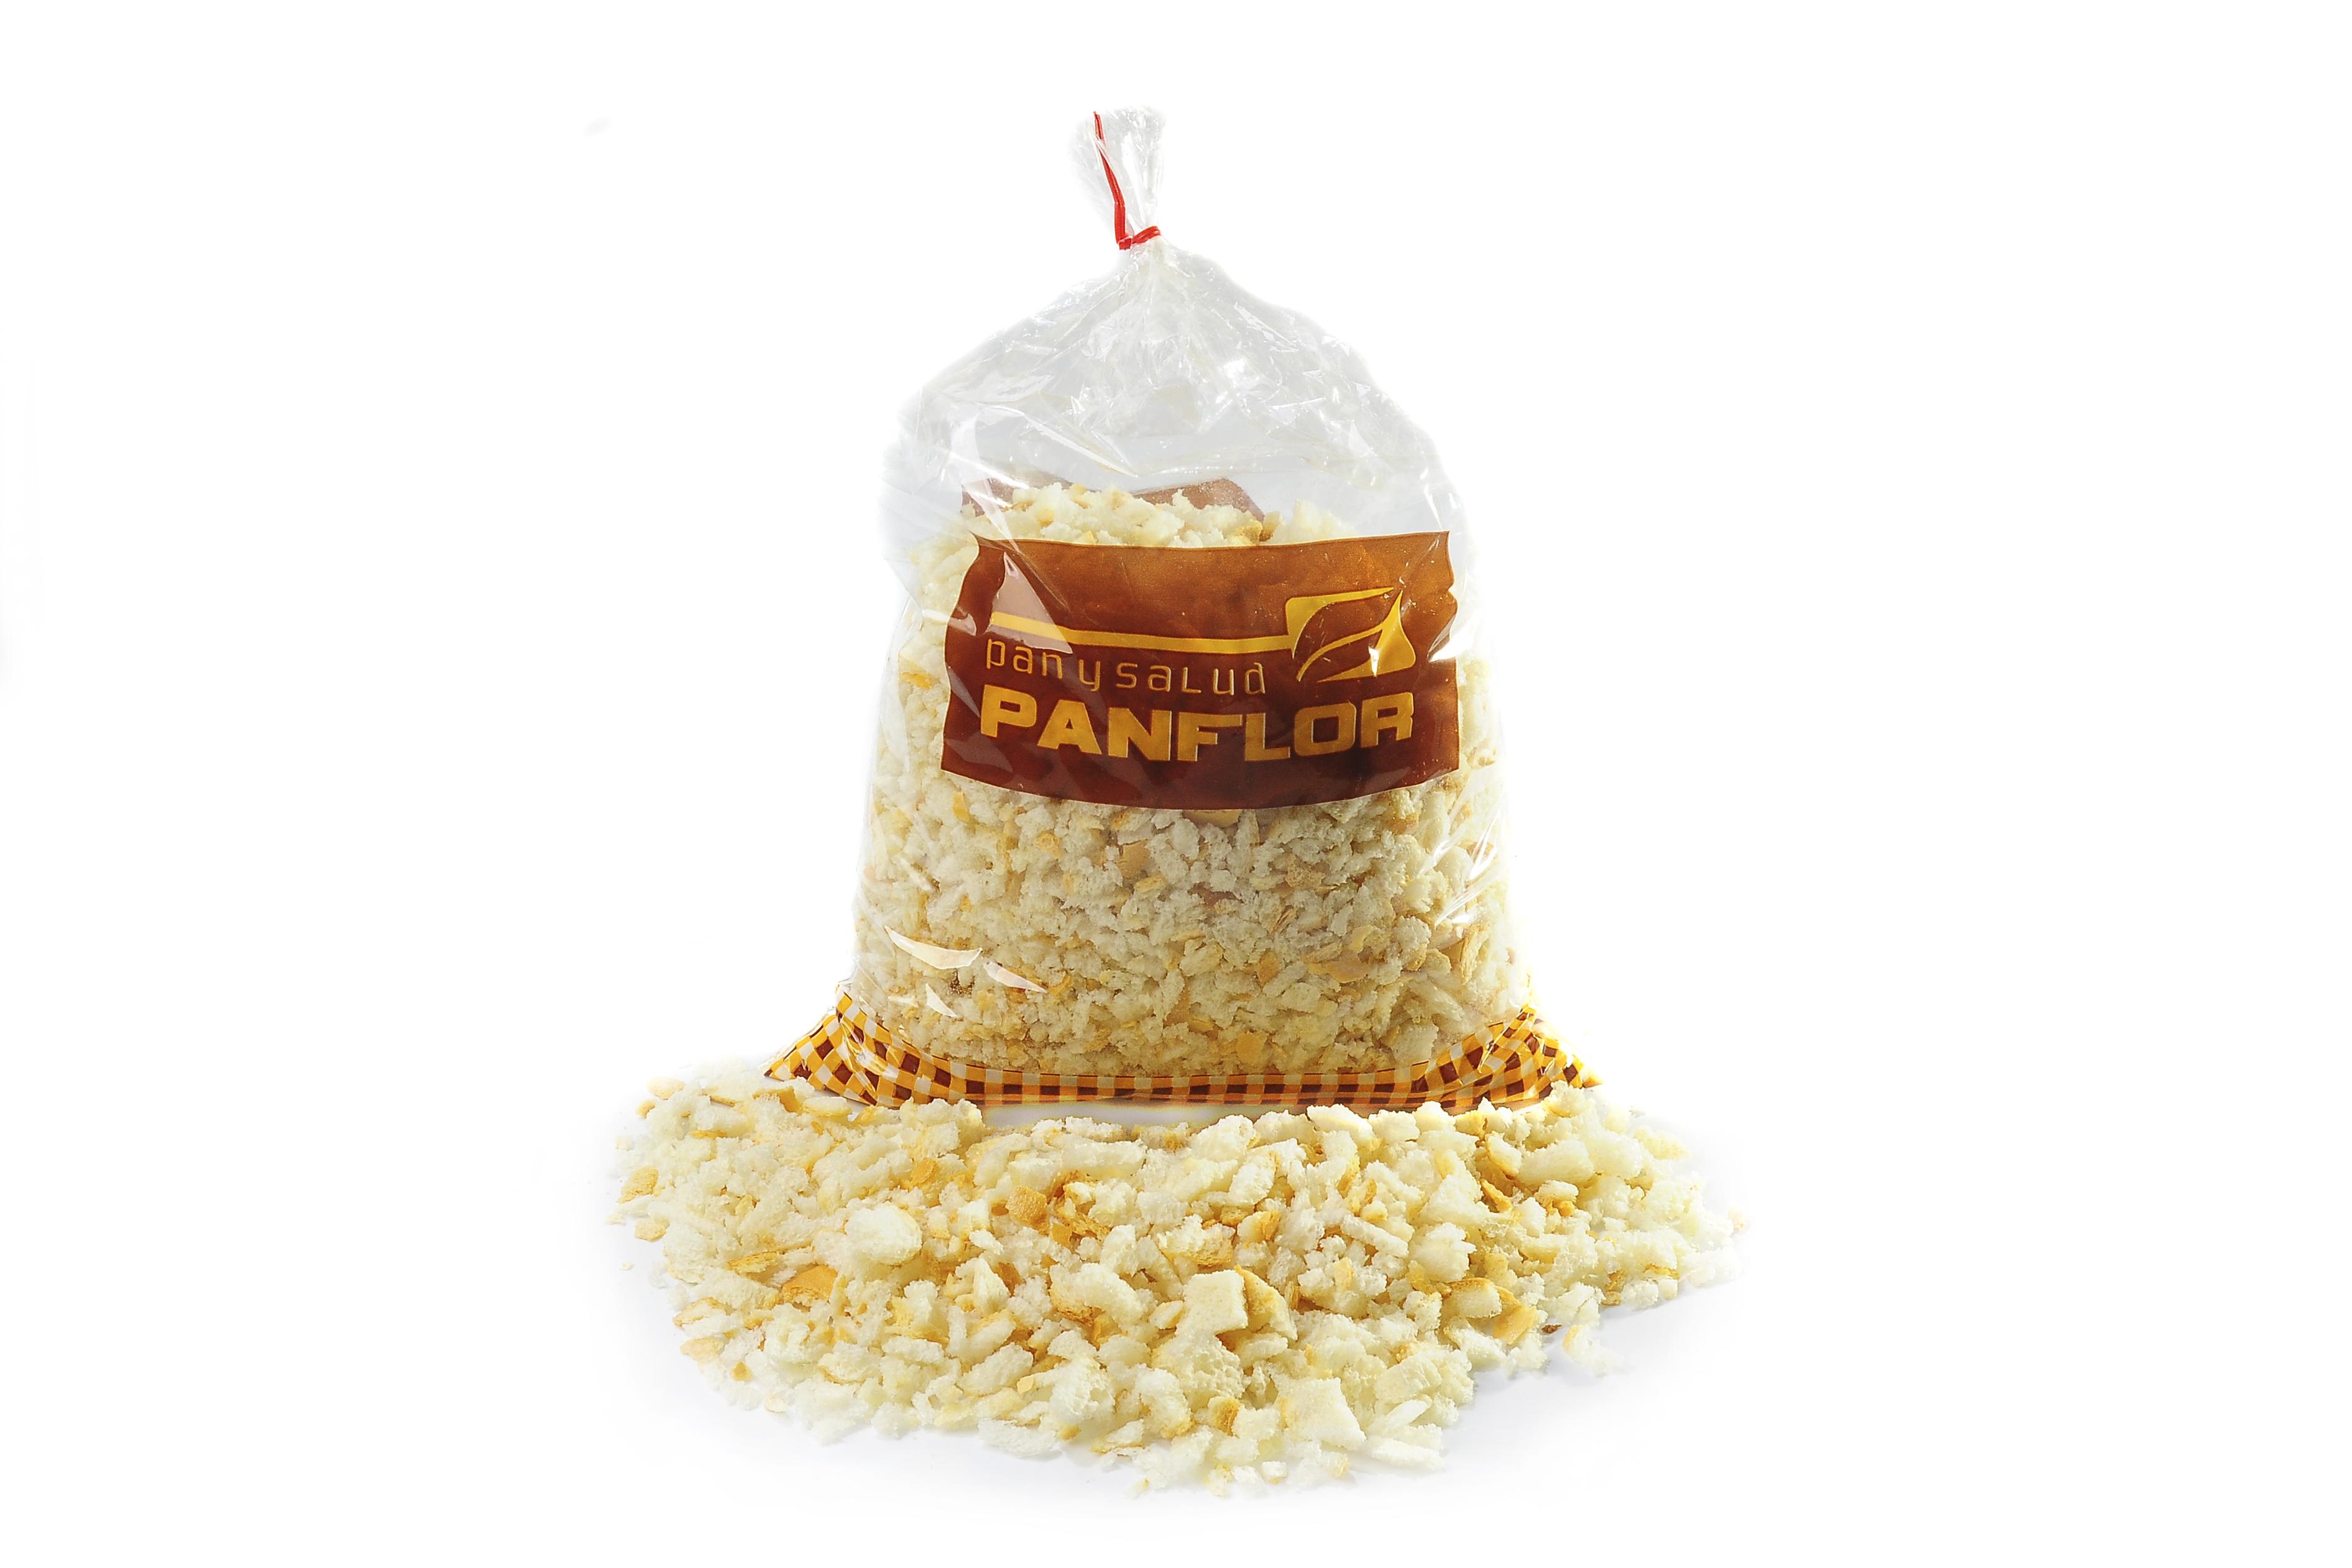 Pan Migas - Pan de migas